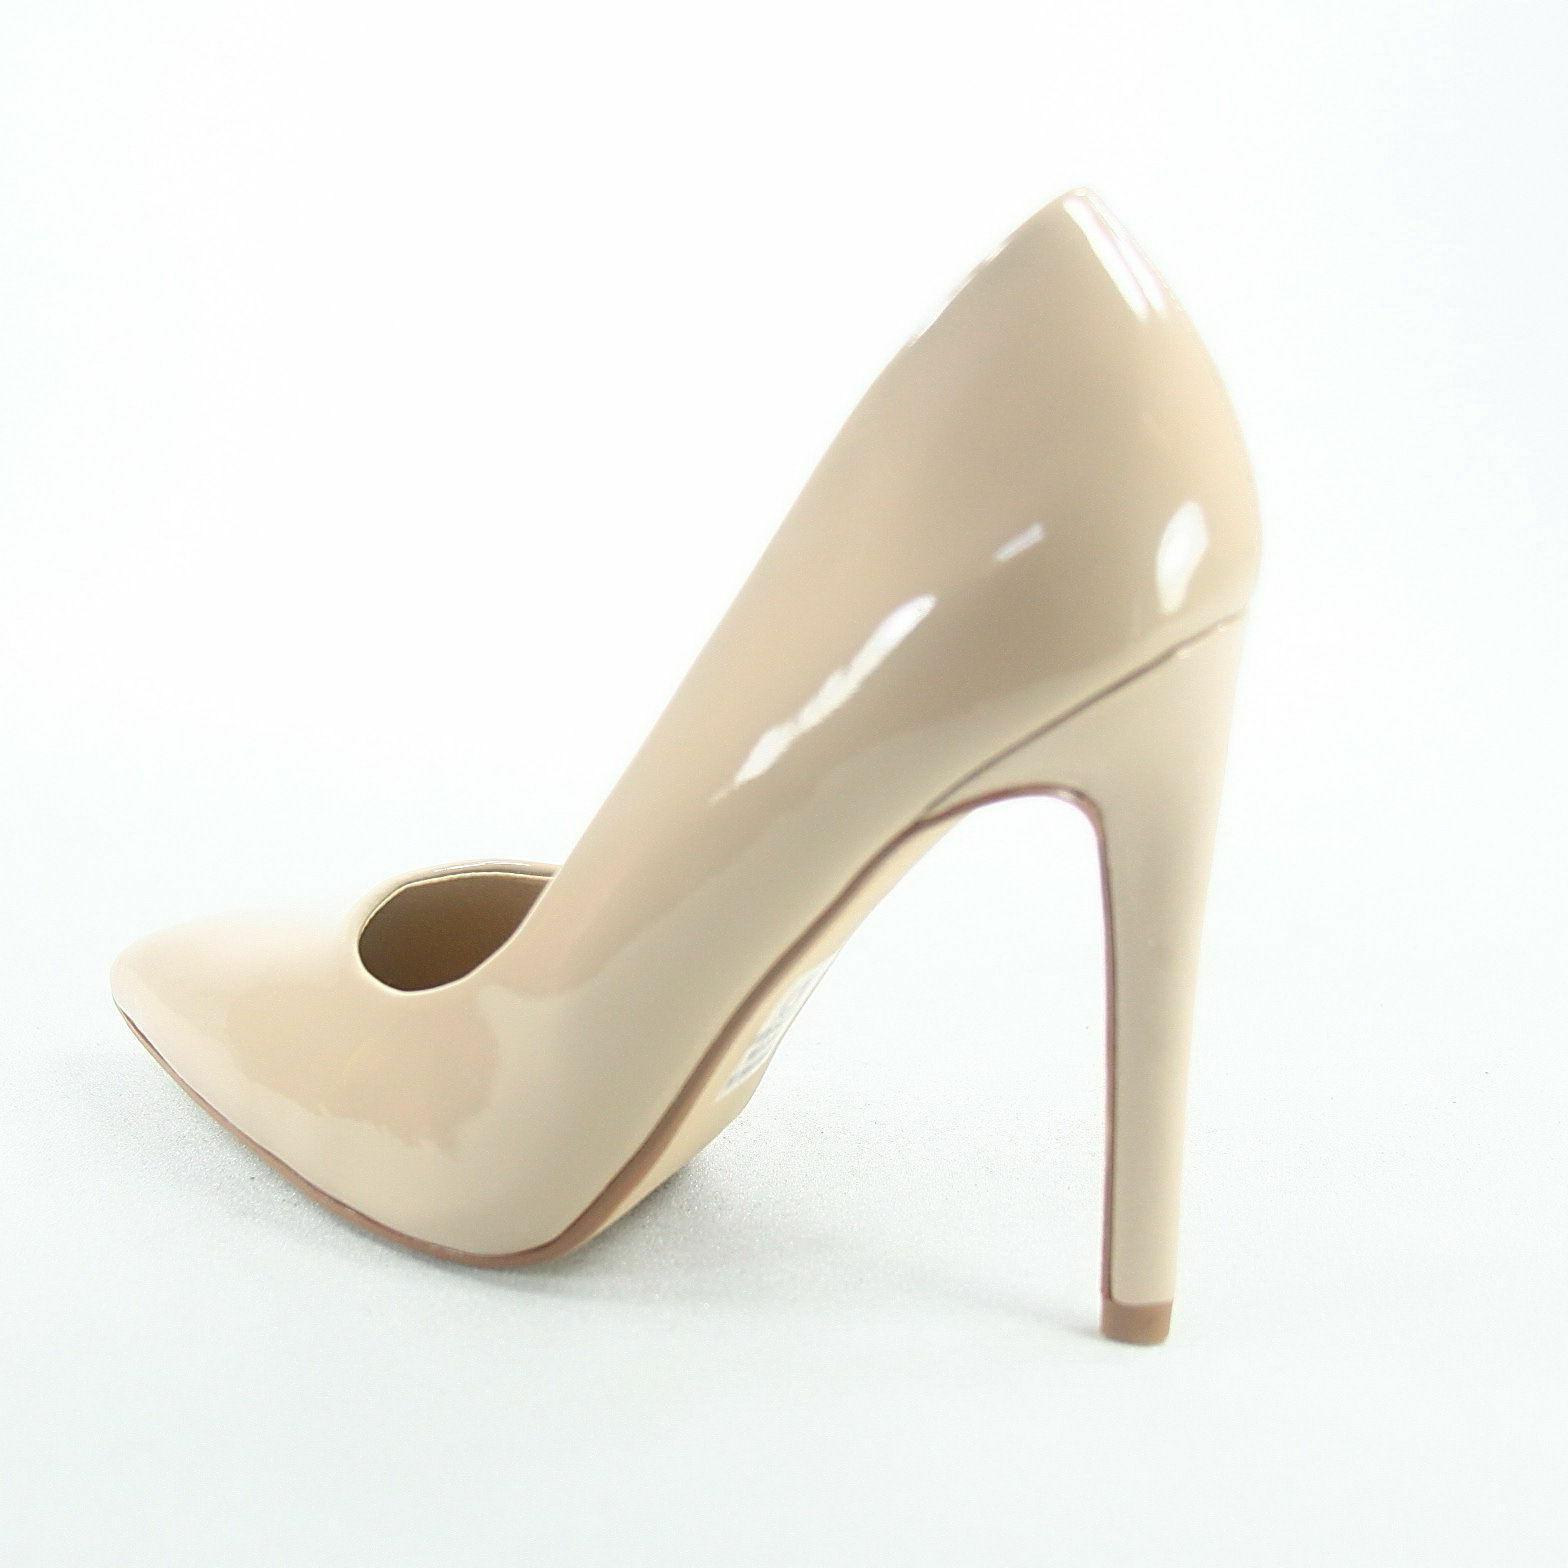 NEW Pointy Toe Stiletto Heel Size 5.5 -